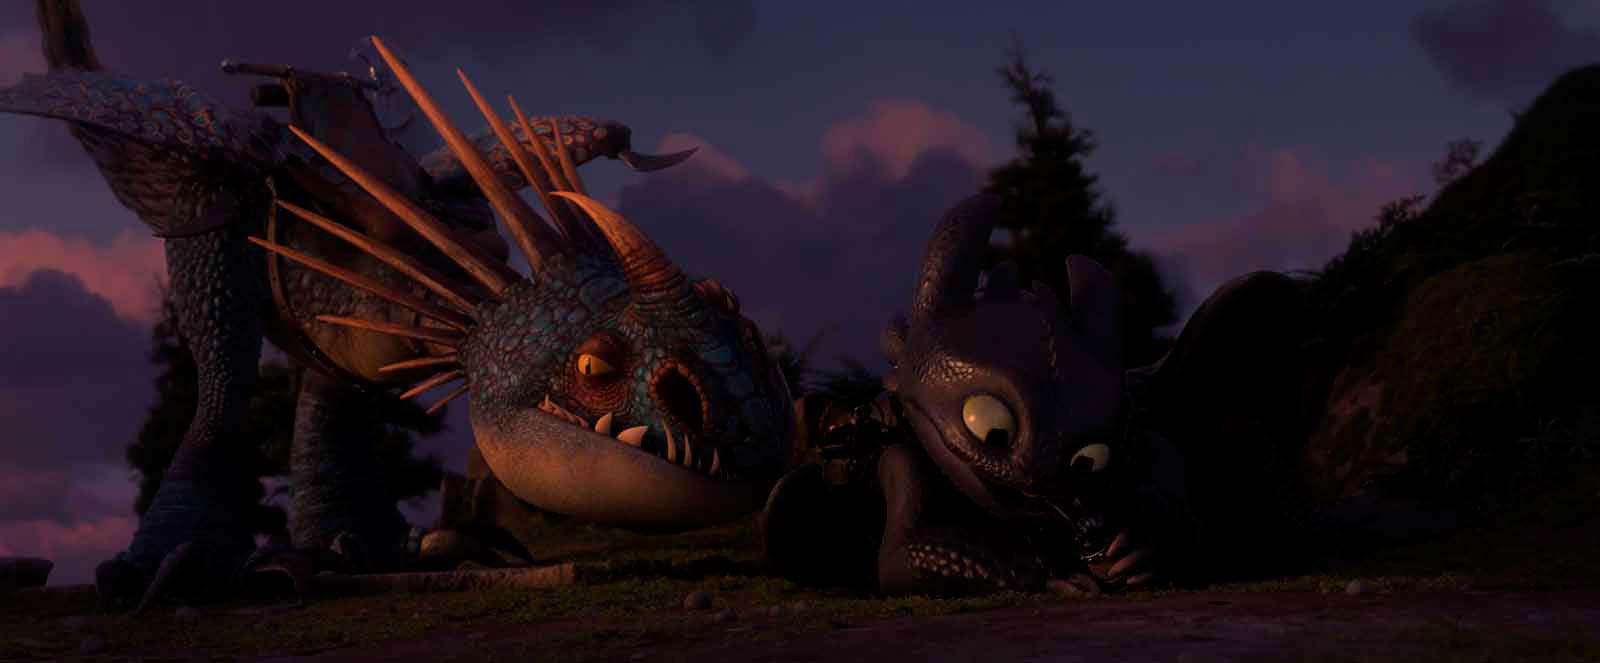 Dragons 3 : Le monde caché DVDRip VF